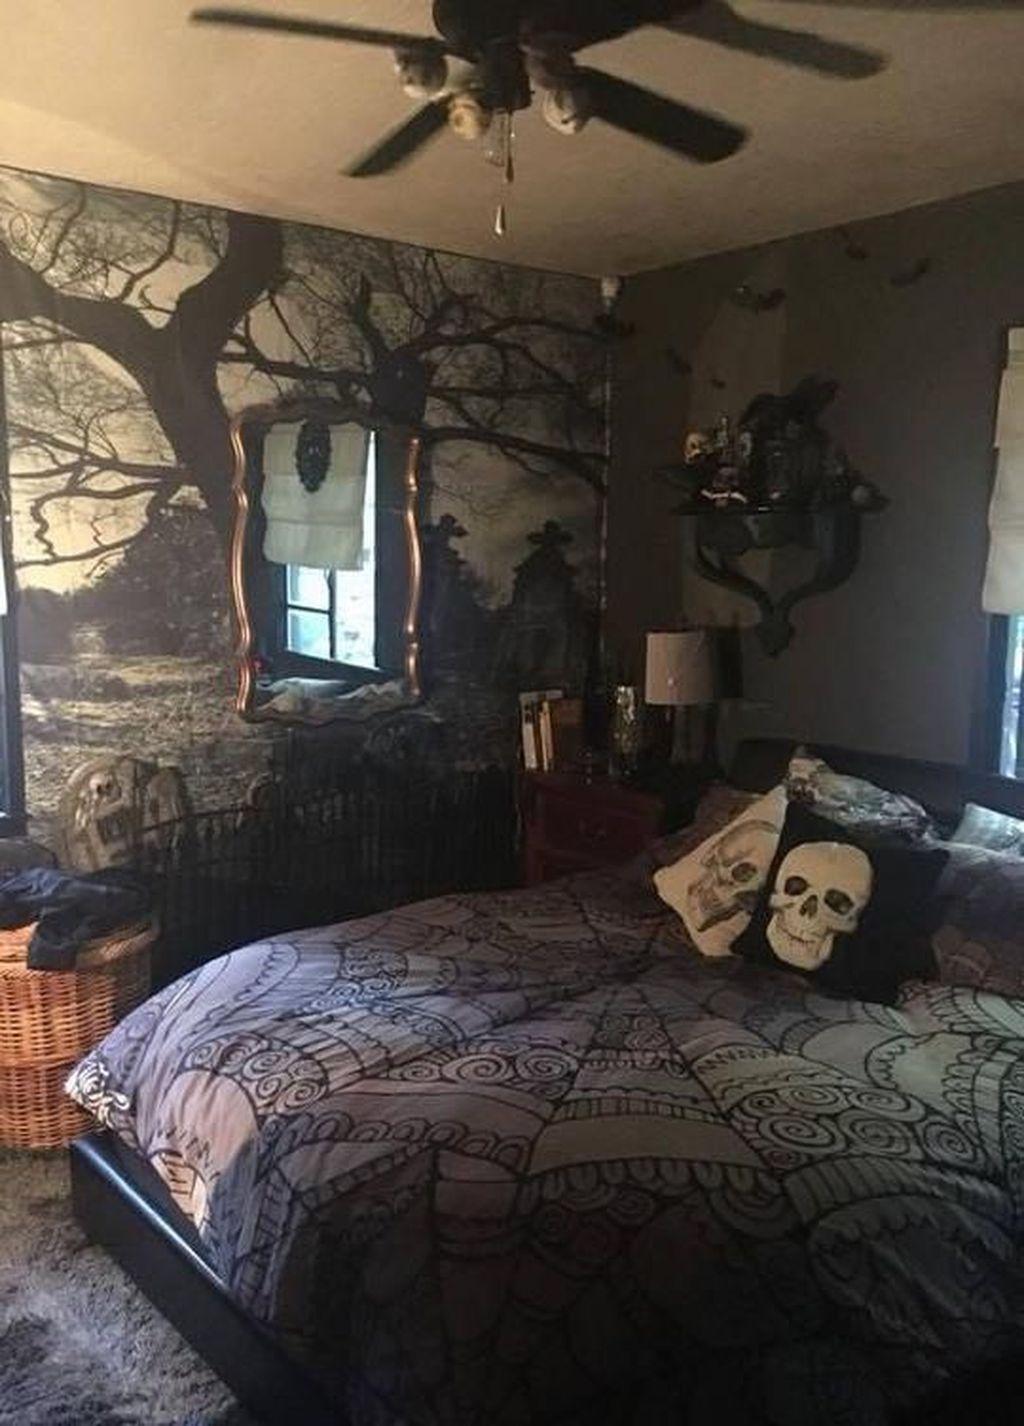 Amazing Bedroom Decoration Ideas With Halloween Theme 10